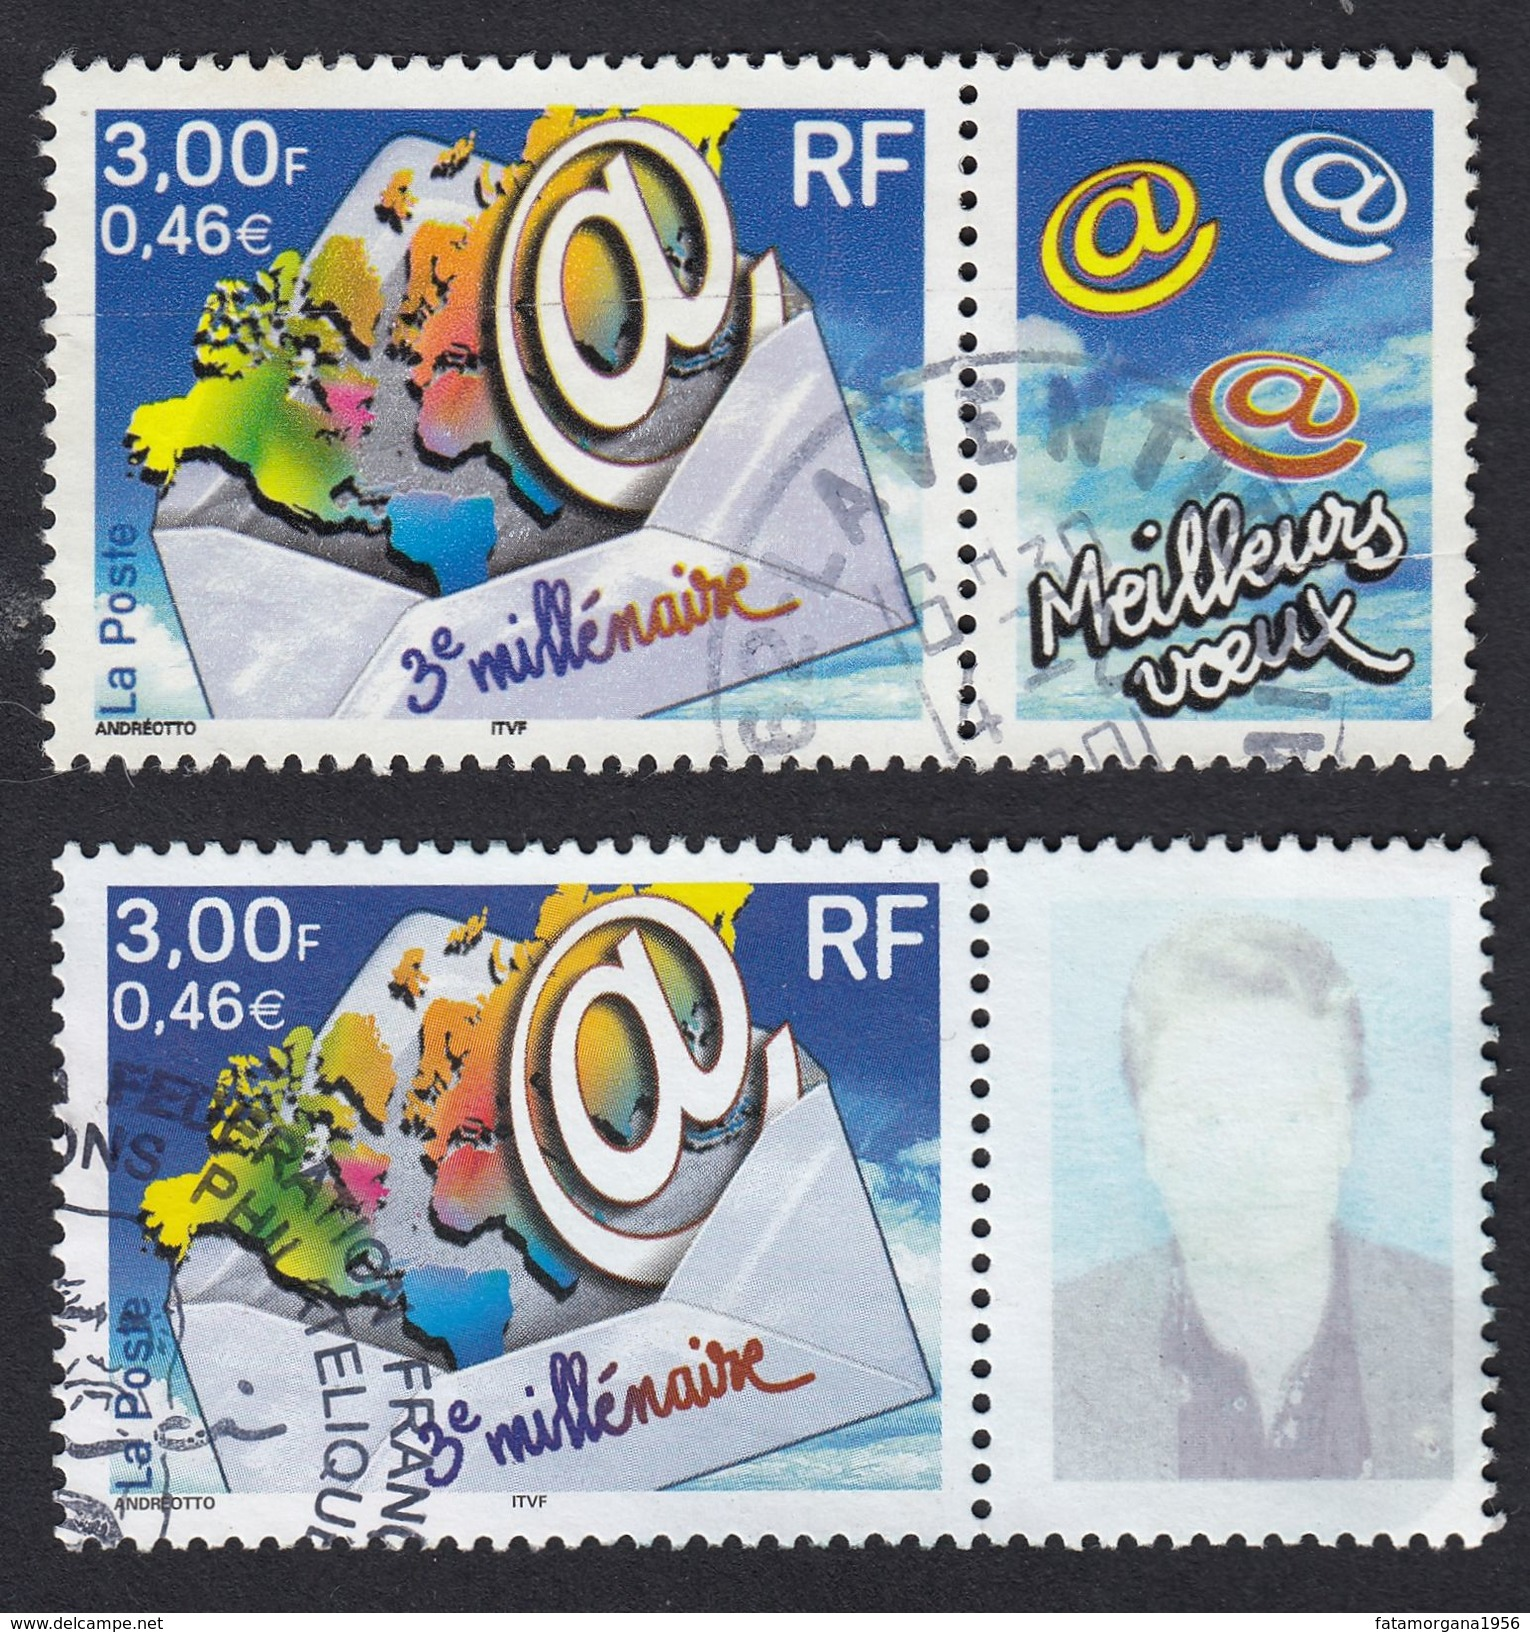 "FRANCE Francia Frankreich - 2000 - 2 Valori Usati ""Terzo Millennio"": Yvert 3365 - Frankreich"